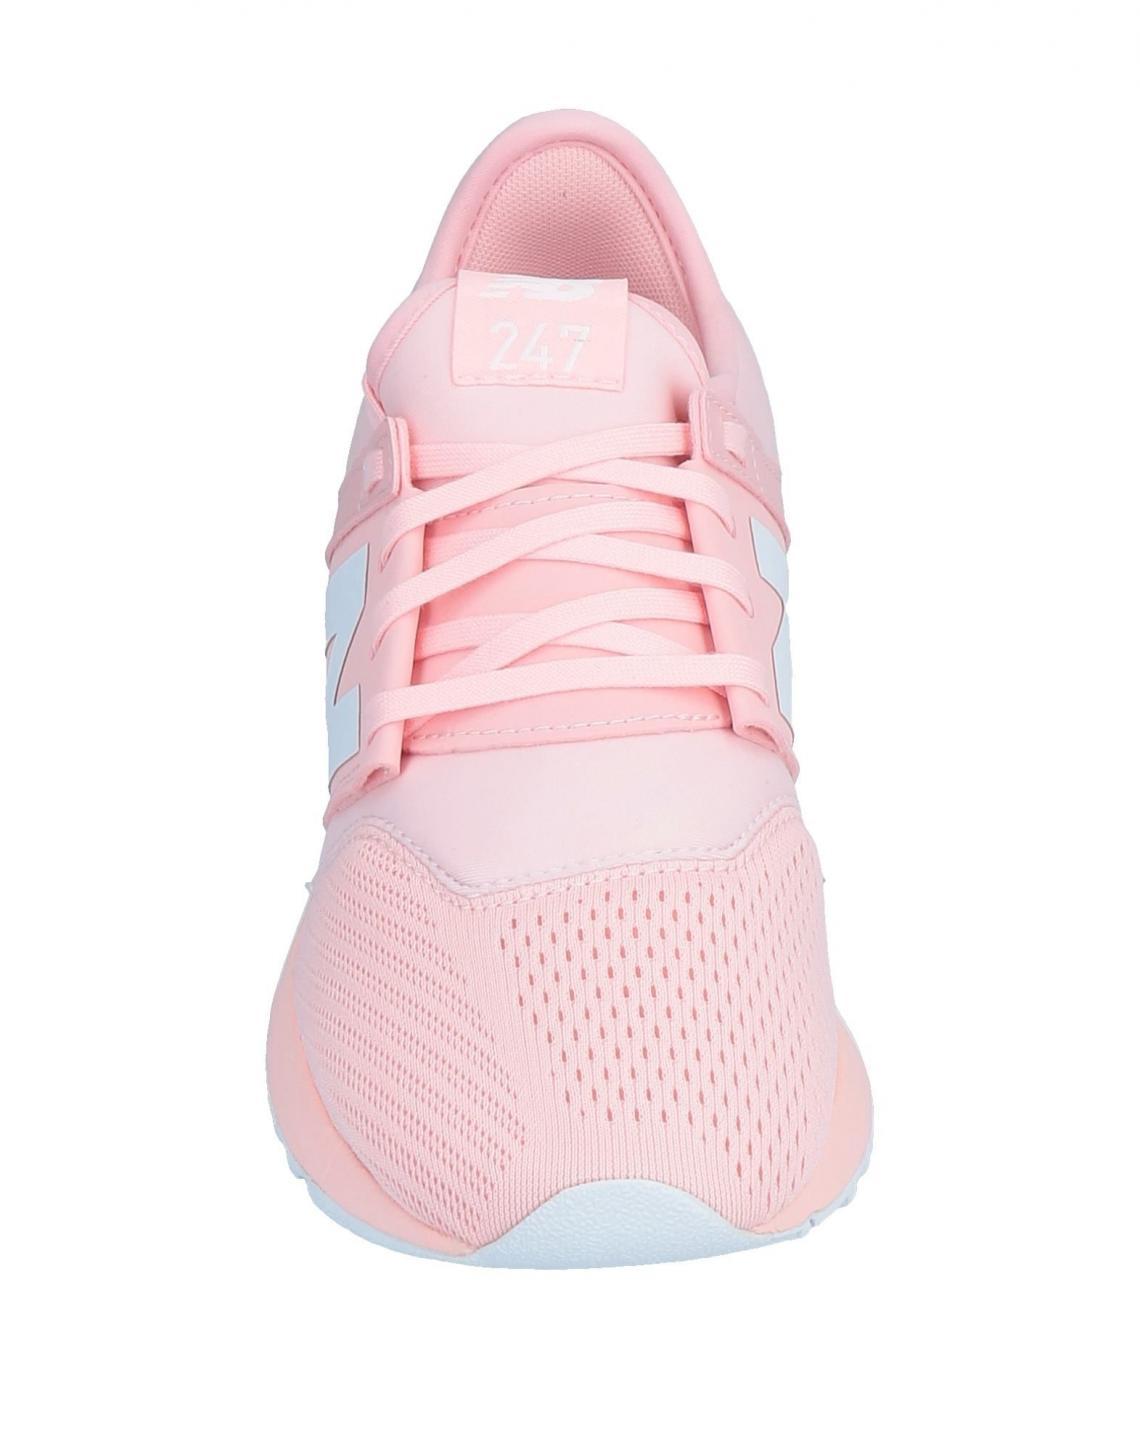 Rose Clair Femme Baskets,Adidas Swift Run W Femme Baskets Rose clair - 8 UK  Rose clair